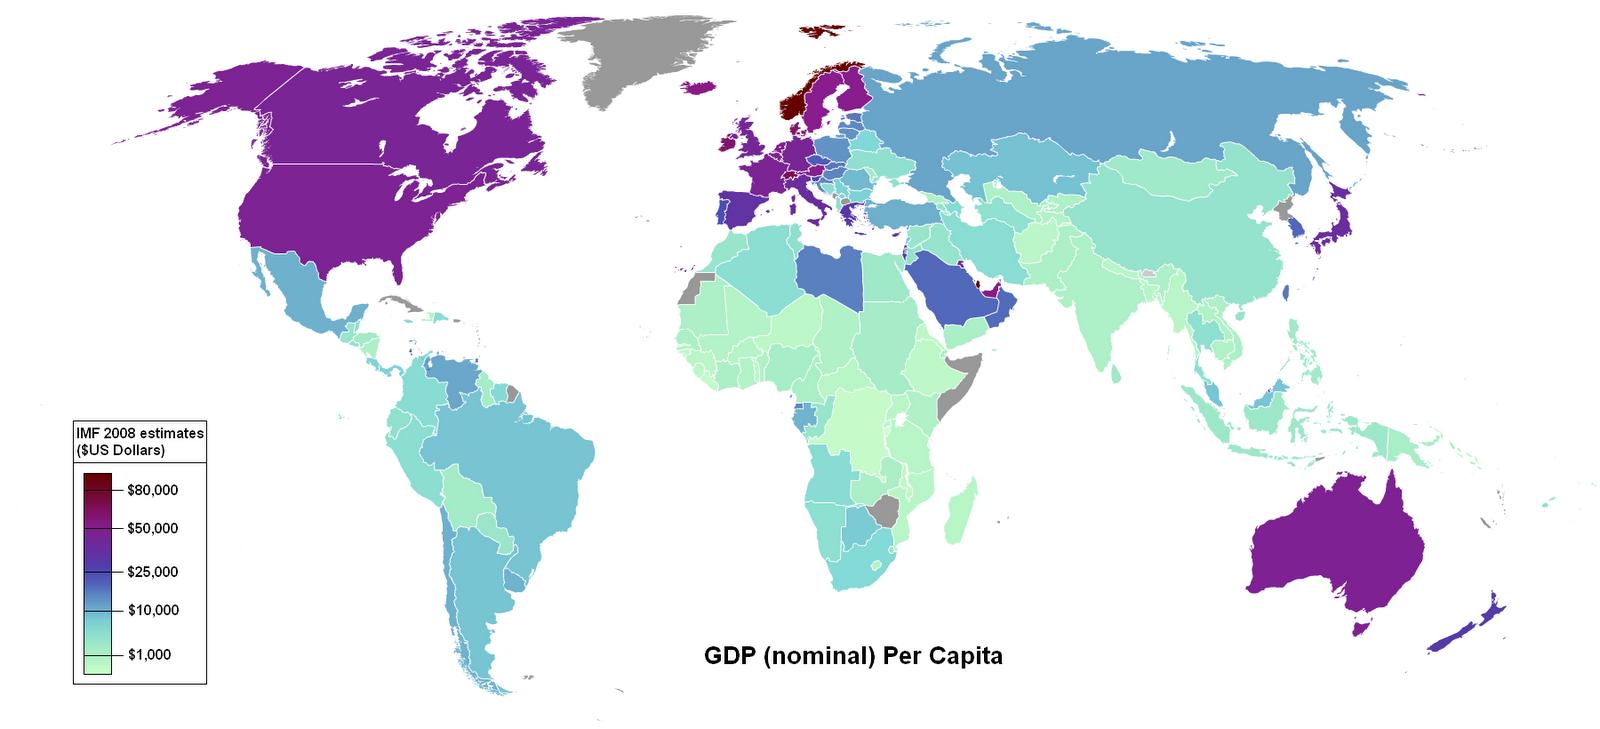 external image GDP_nominal_per_capita_world_map_IMF_2008.png